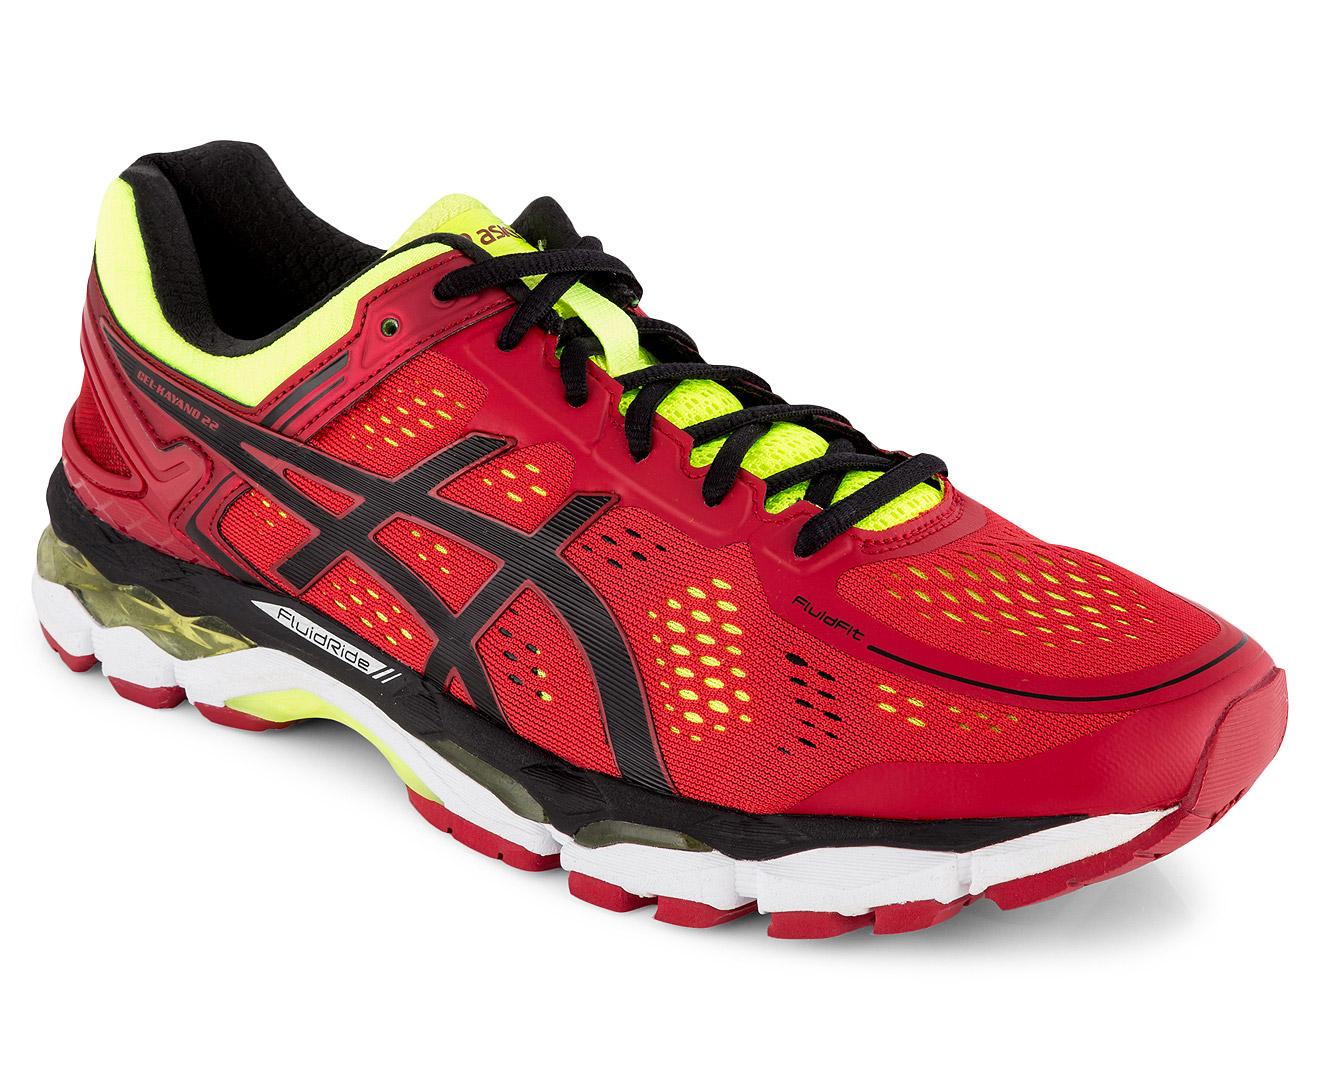 best selling cheapest price buy popular ASICS Men's GEL-Kayano 22 Shoe - Red Pepper/Black/Flash Yellow